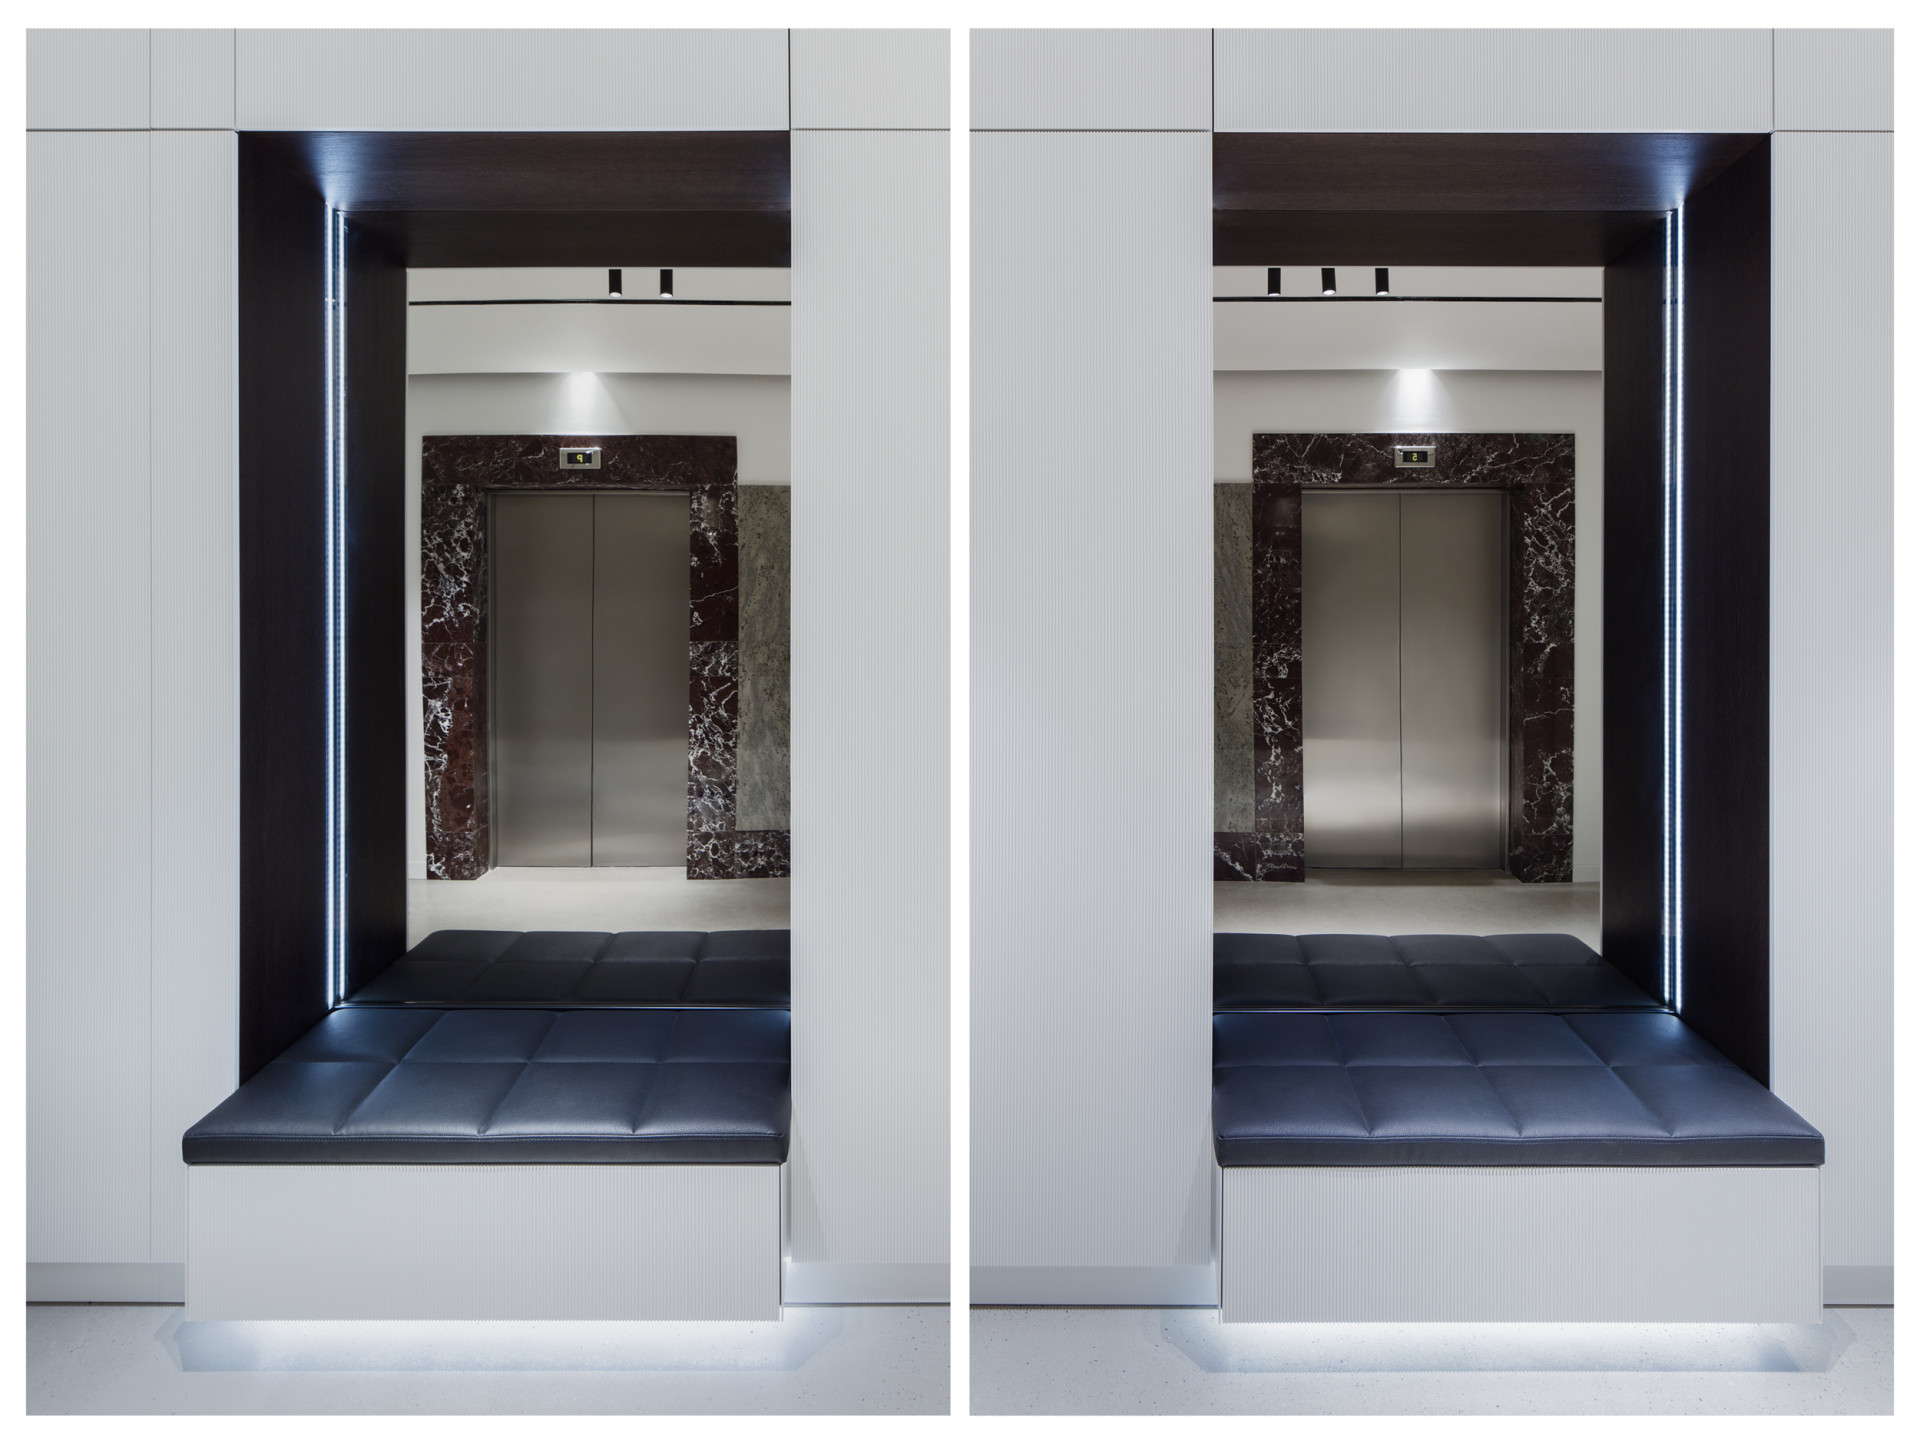 Denisa Strmiskova Studio | spatial design MILLENNIUM RECEPTION LOBBY